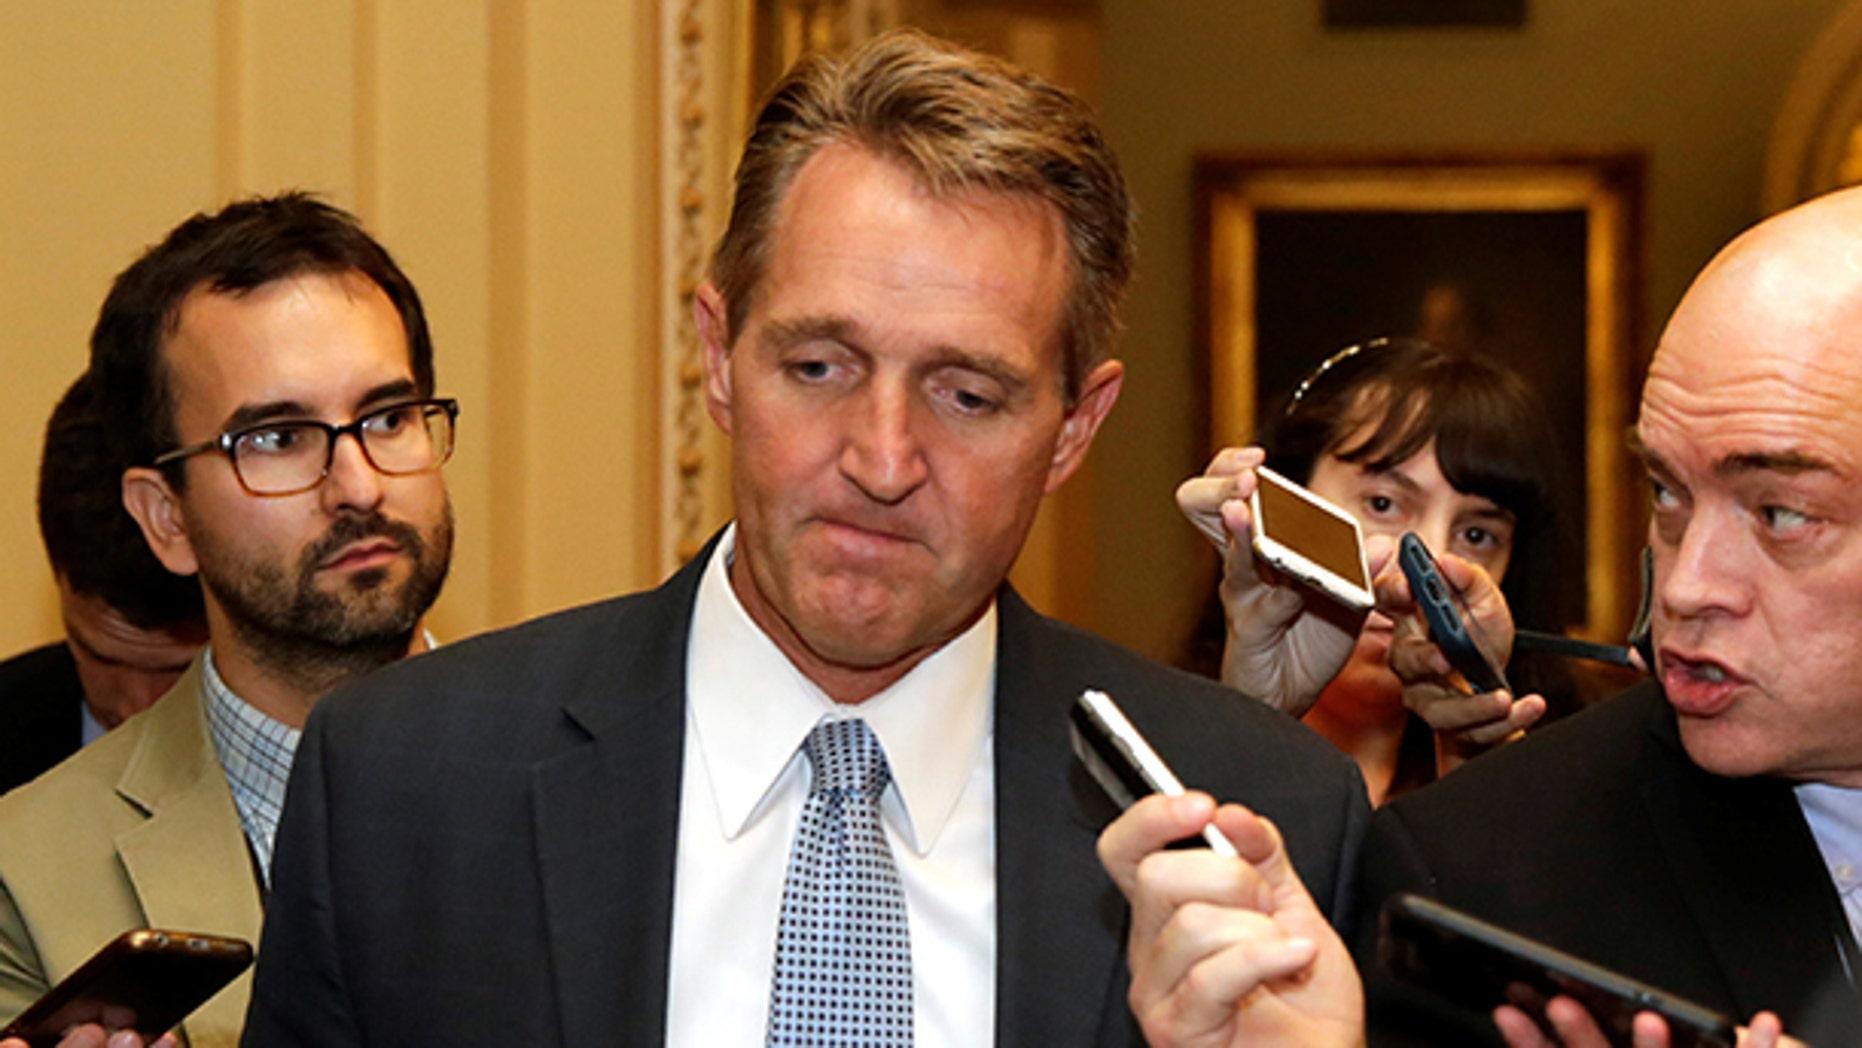 Senator Jeff Flake (R-AZ) talks to reporters as he arrives for a Senate health care vote on Capitol Hill in Washington, U.S., July 27, 2017. REUTERS/Yuri Gripas - RTX3D760